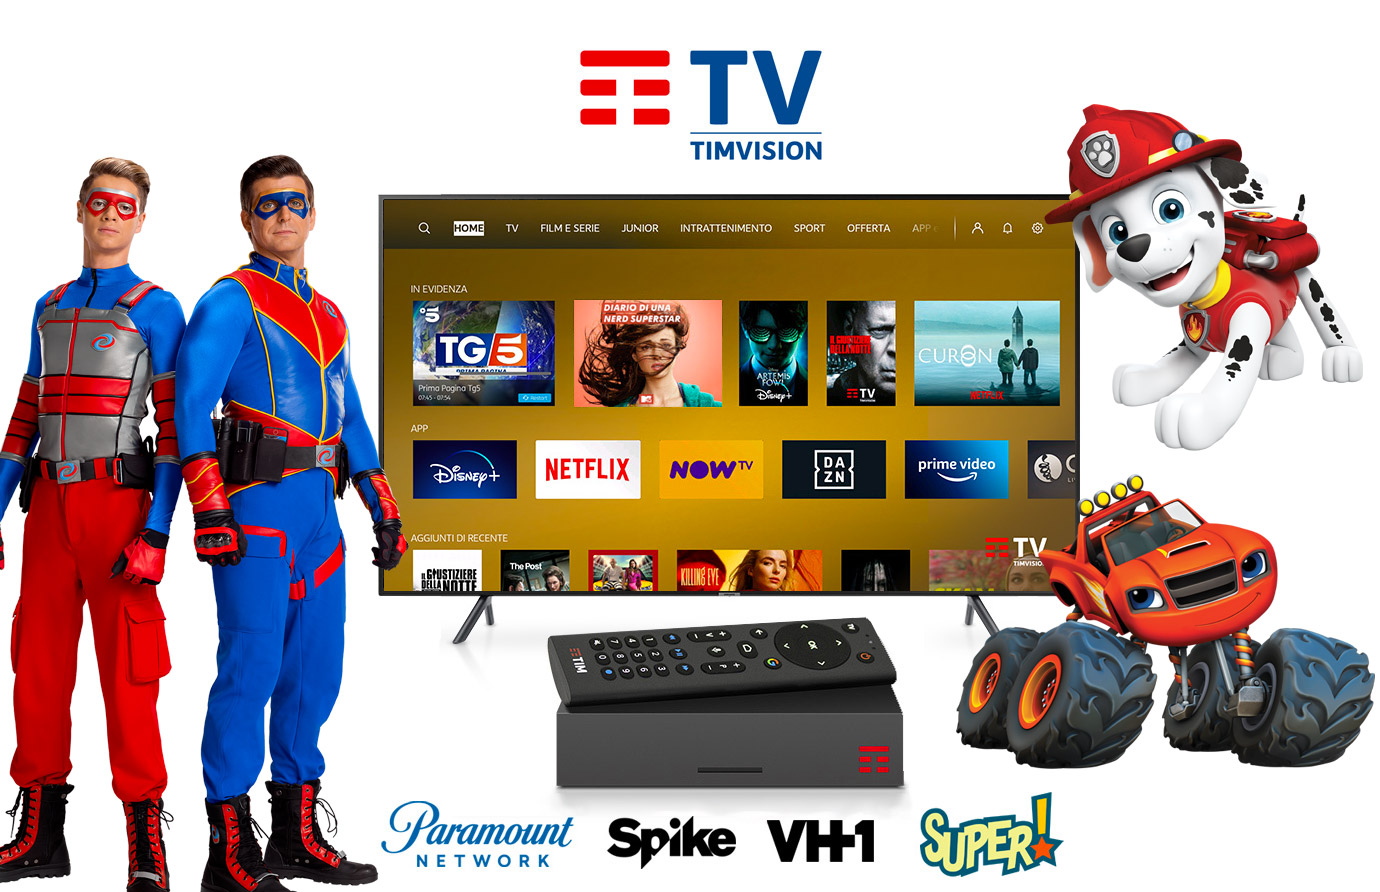 Timvision e ViacomCBS rinnovano accordo, offerta arricchita con canali TV